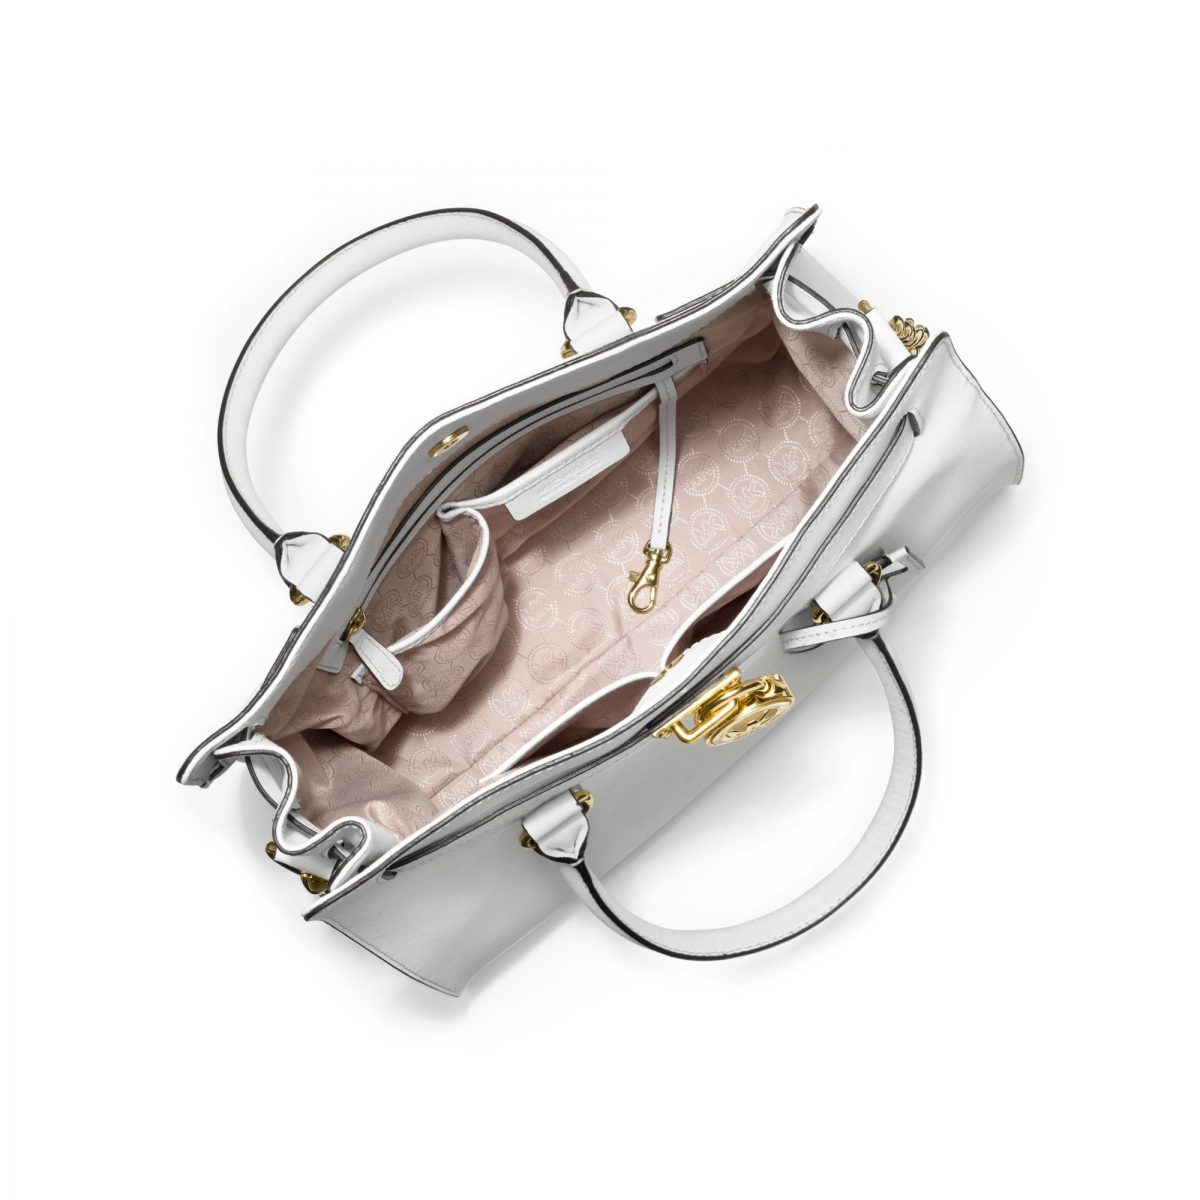 Сумка Michael Kors Savannah Large Saffiano Leather Satchel